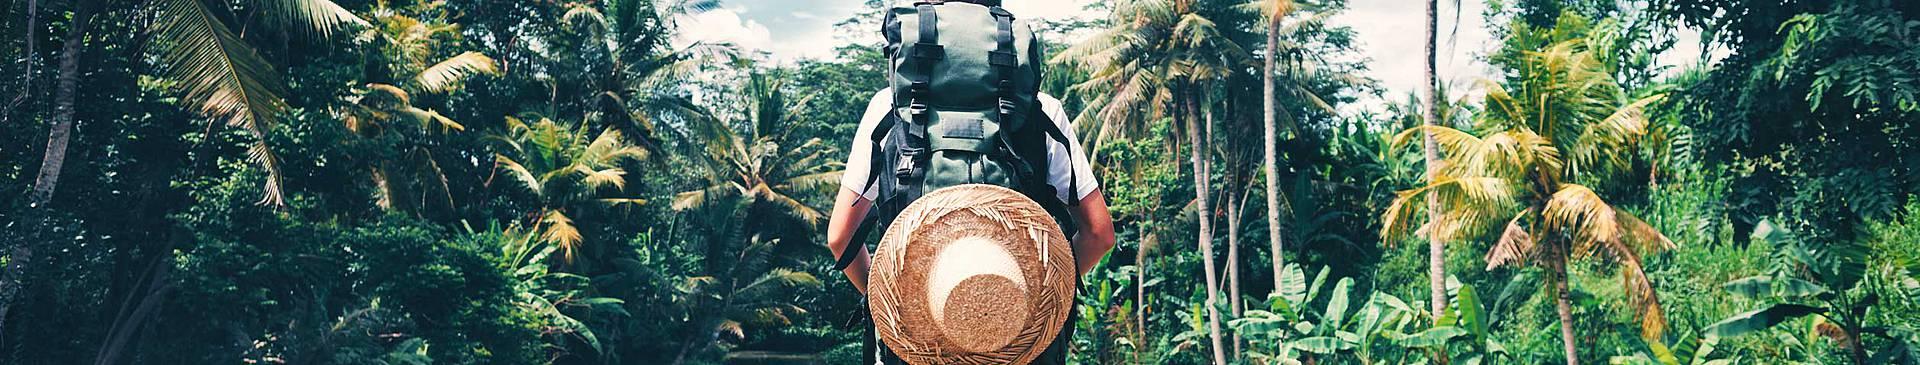 Trekking in Thailandia